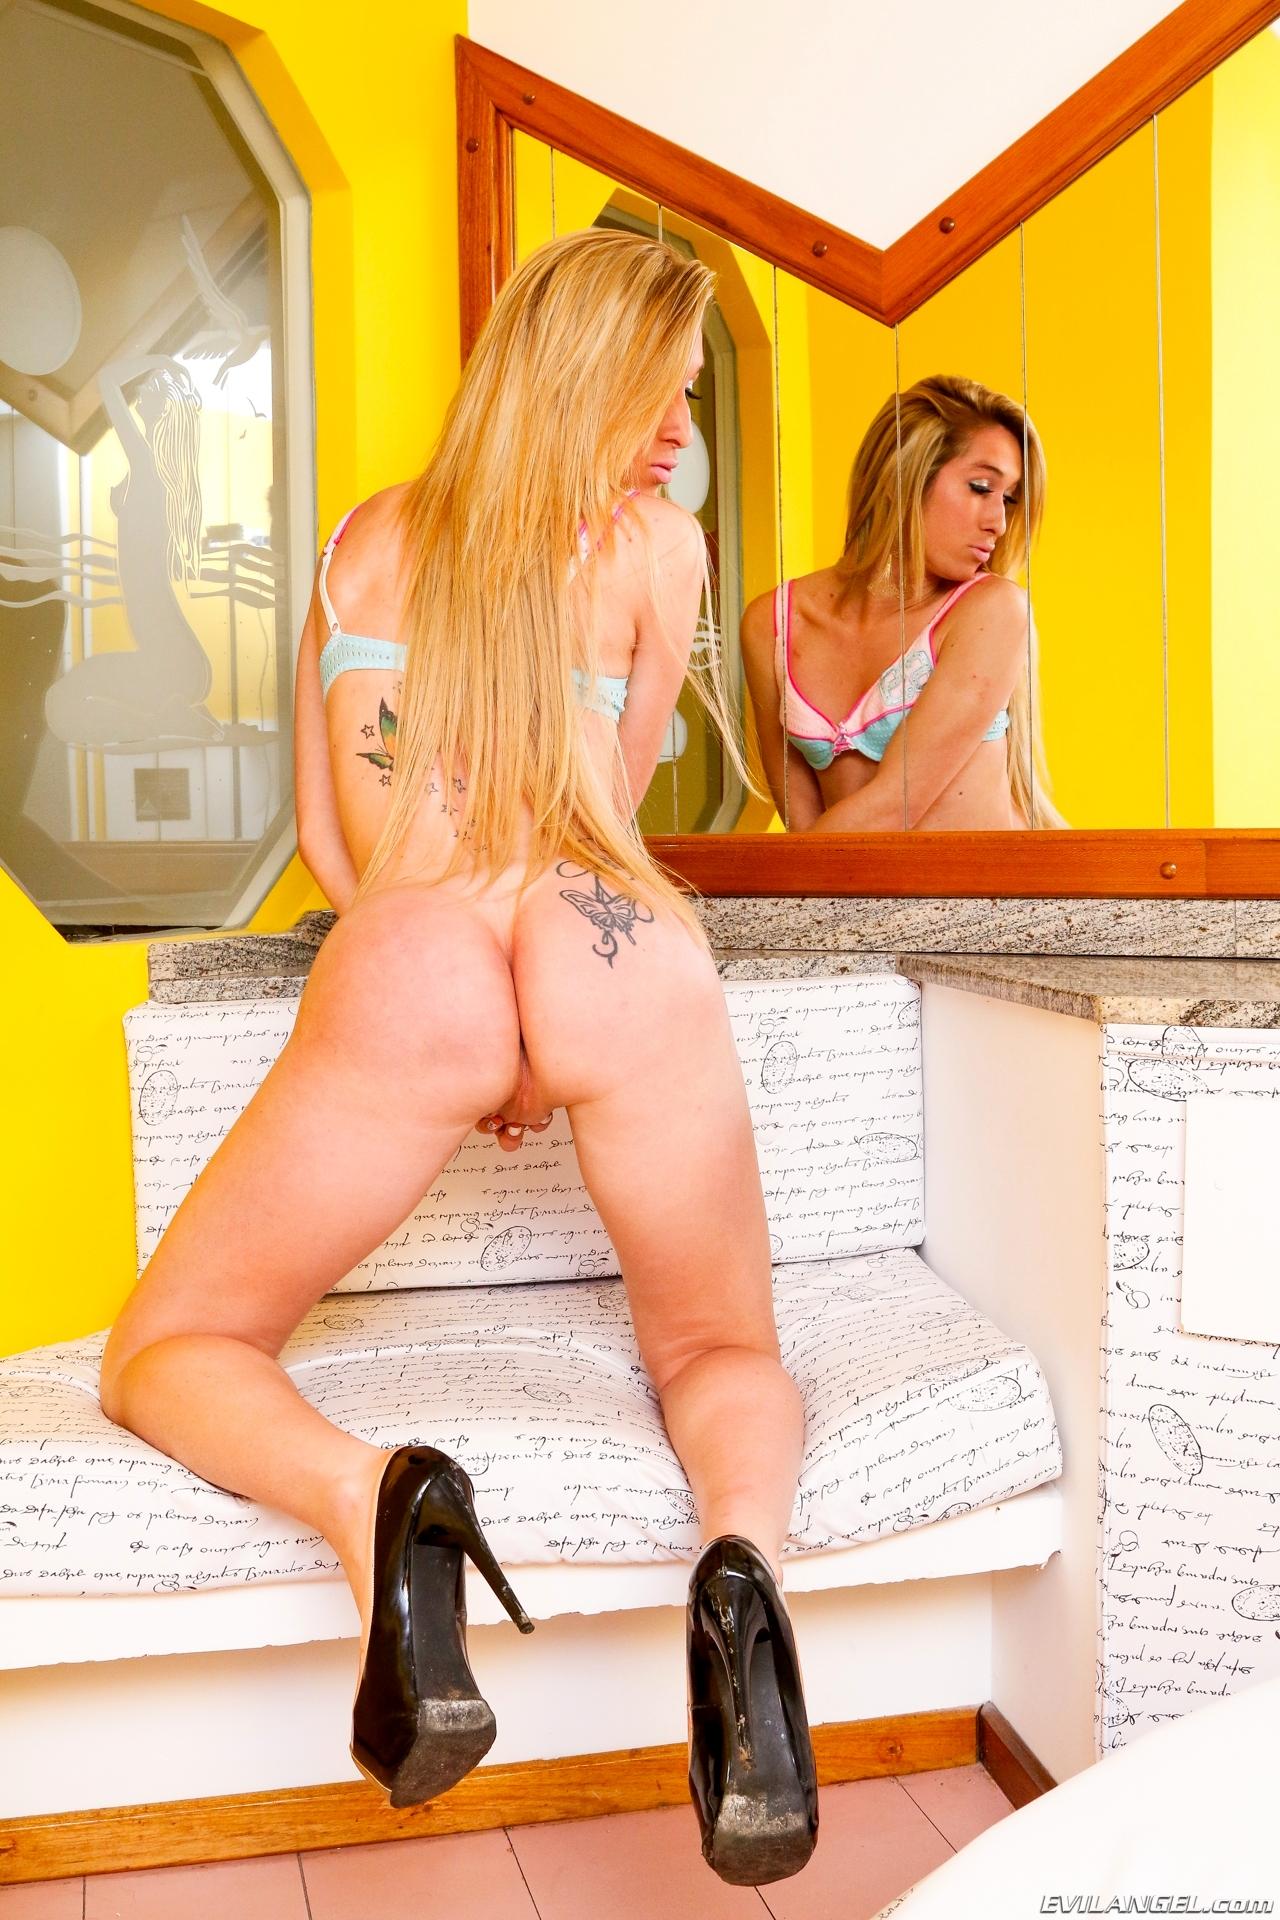 Sensual Blonde Djeniffer Schneider T-Girl Posing In Steamy Panties